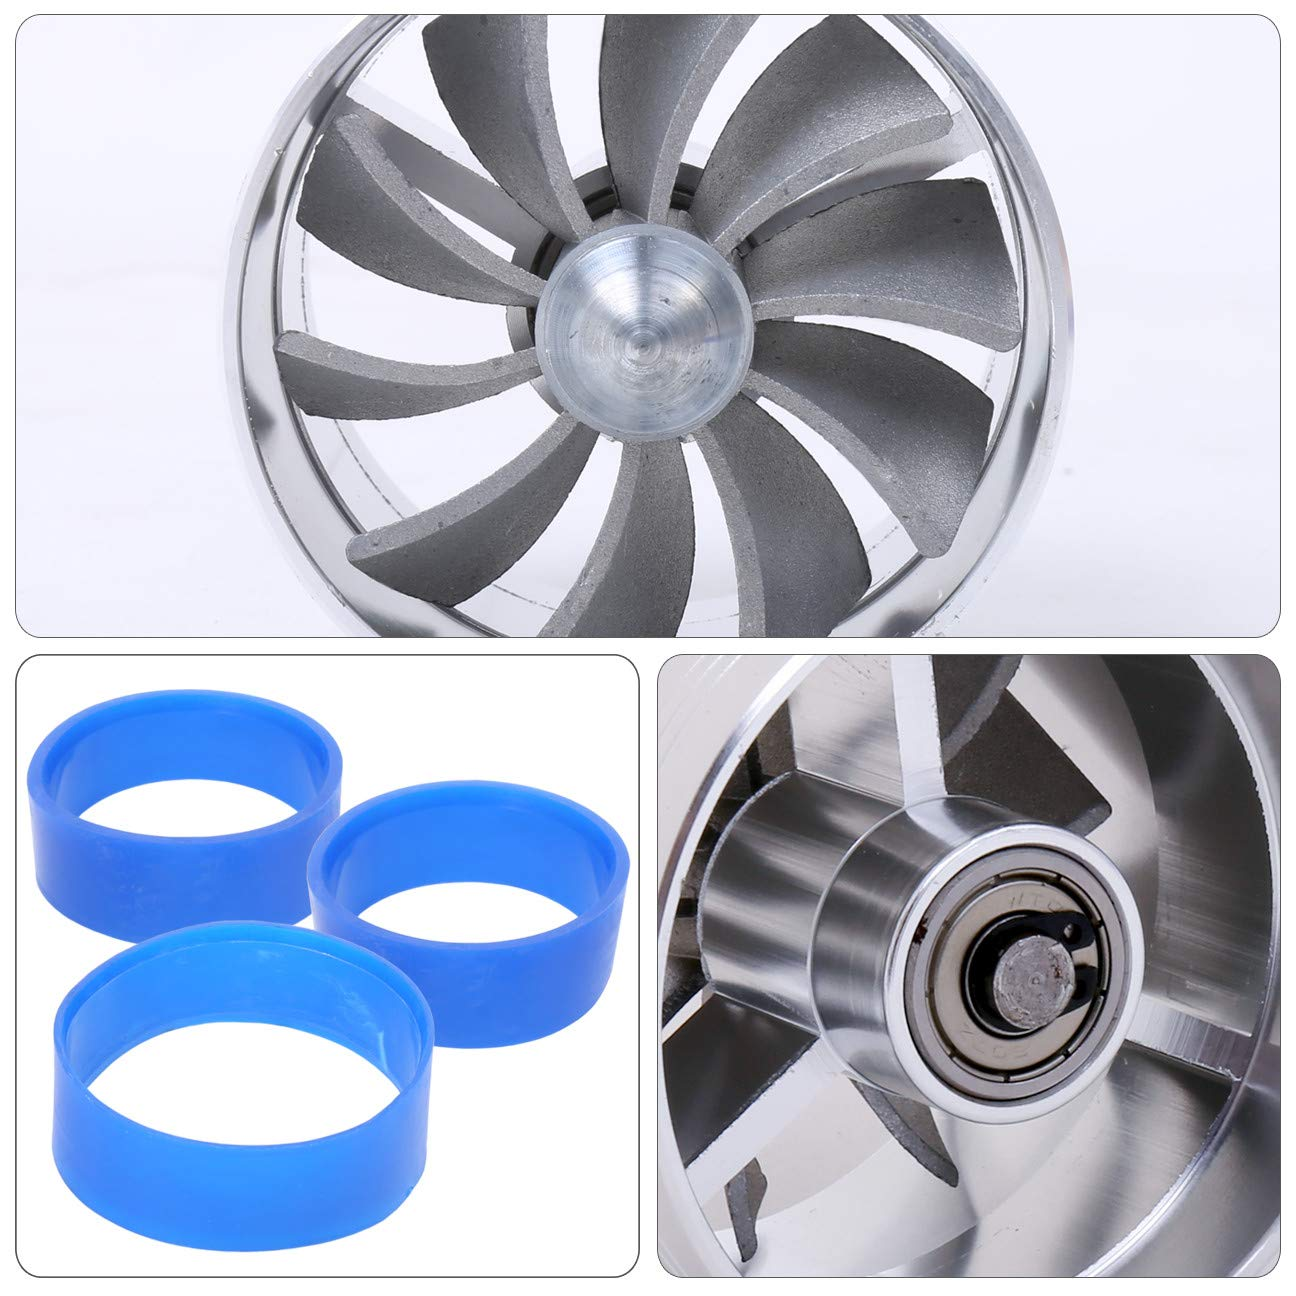 AJP Distributors JDM Sport 3 Blue Fuel Gas Saver Air Intake Turbo Filter Supercharger Turbocharger Propeller Fan Adapter